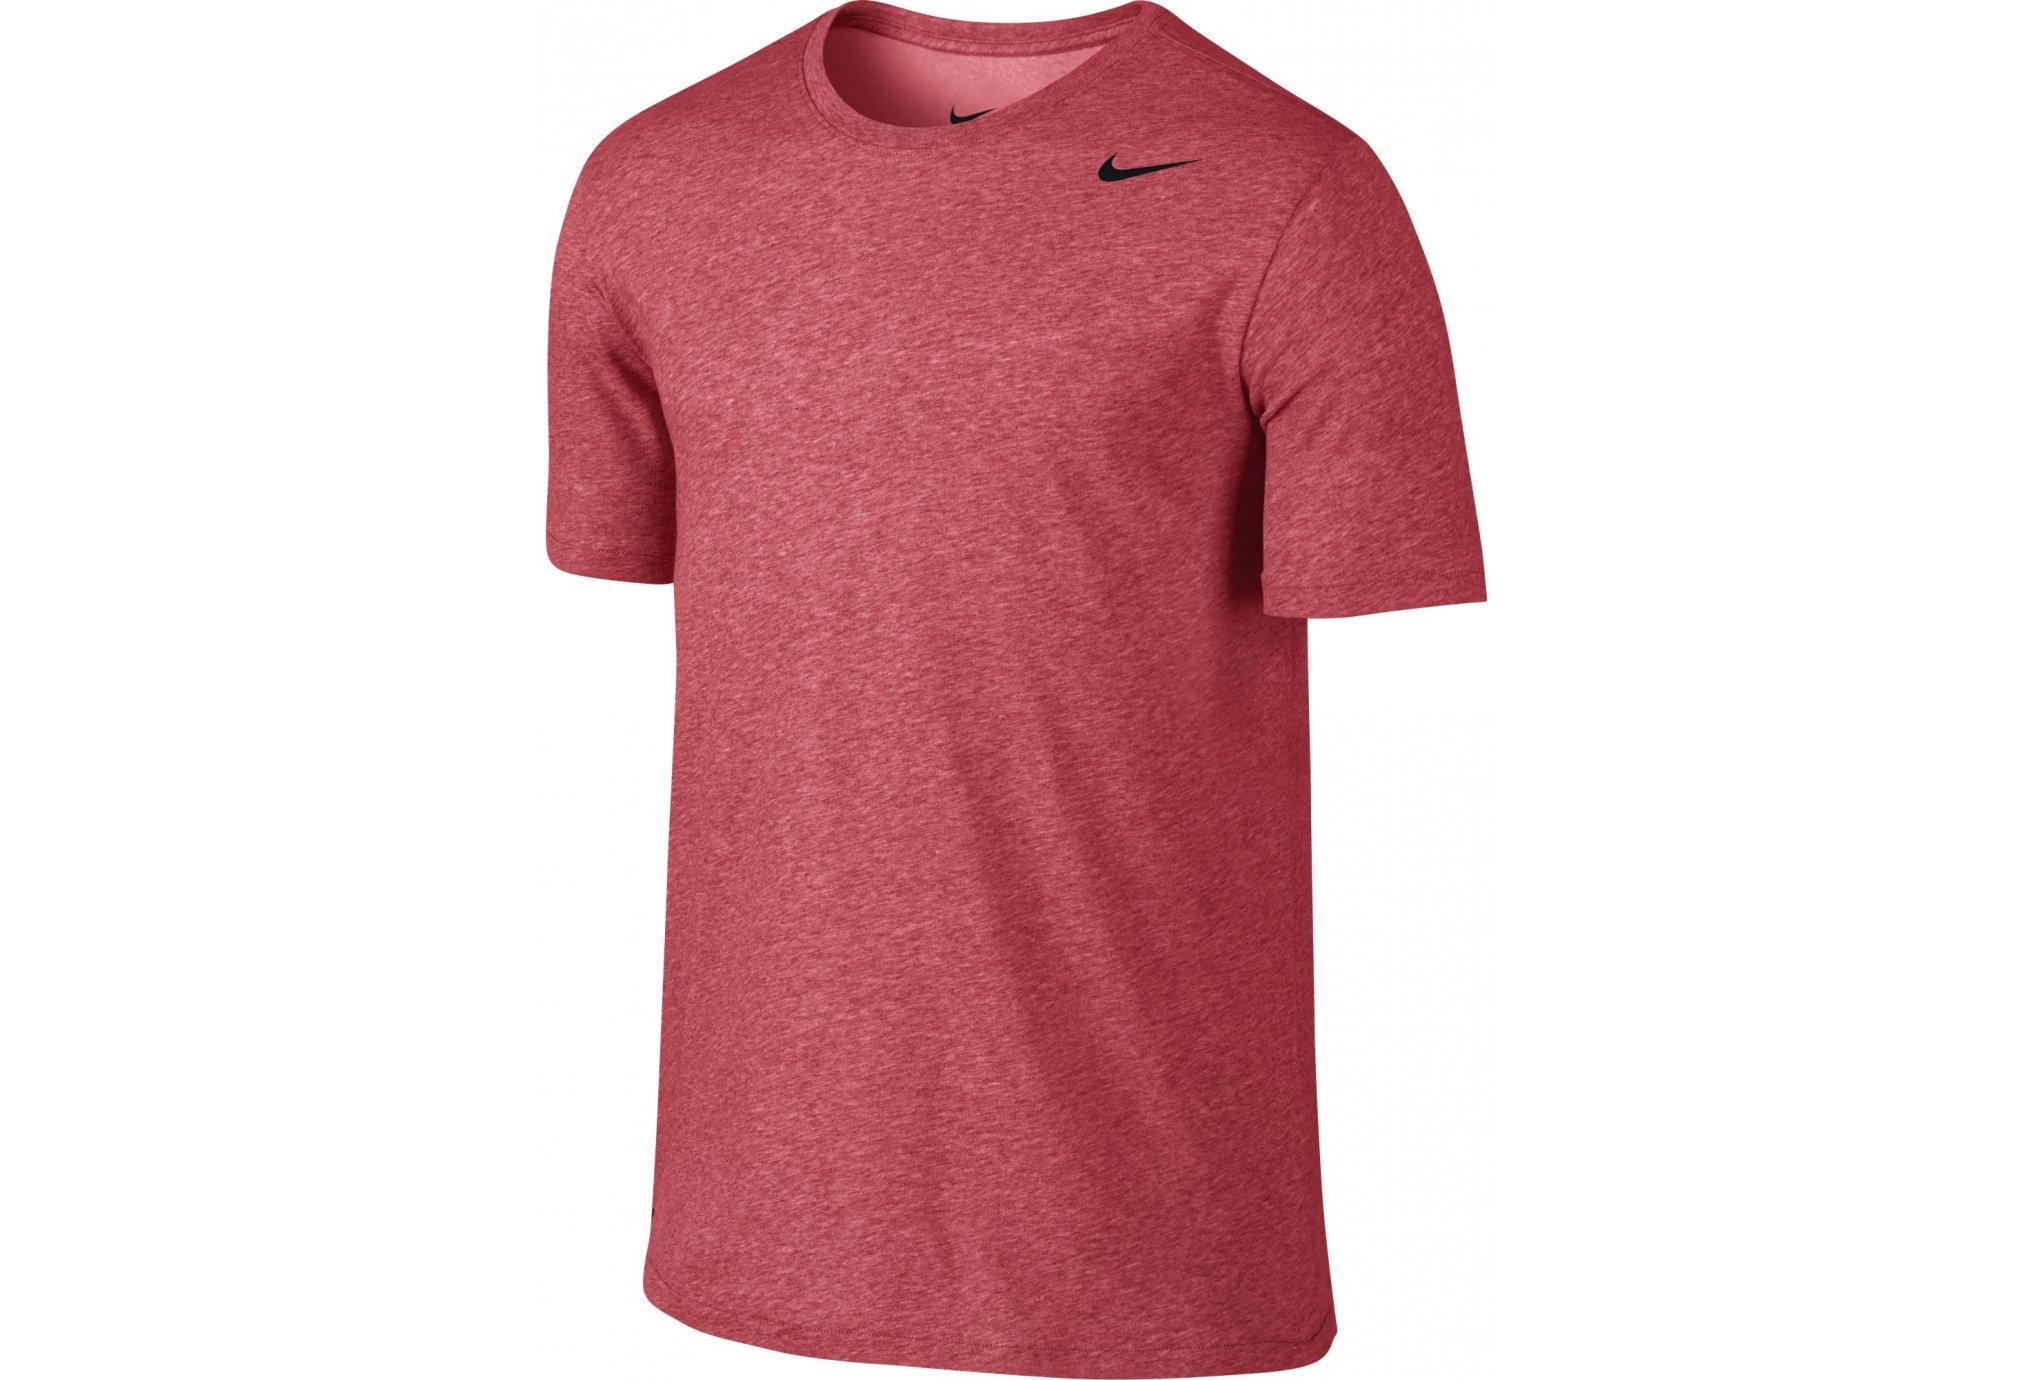 Nike Dri-Fit Cotton Version 2.0 M vêtement running homme